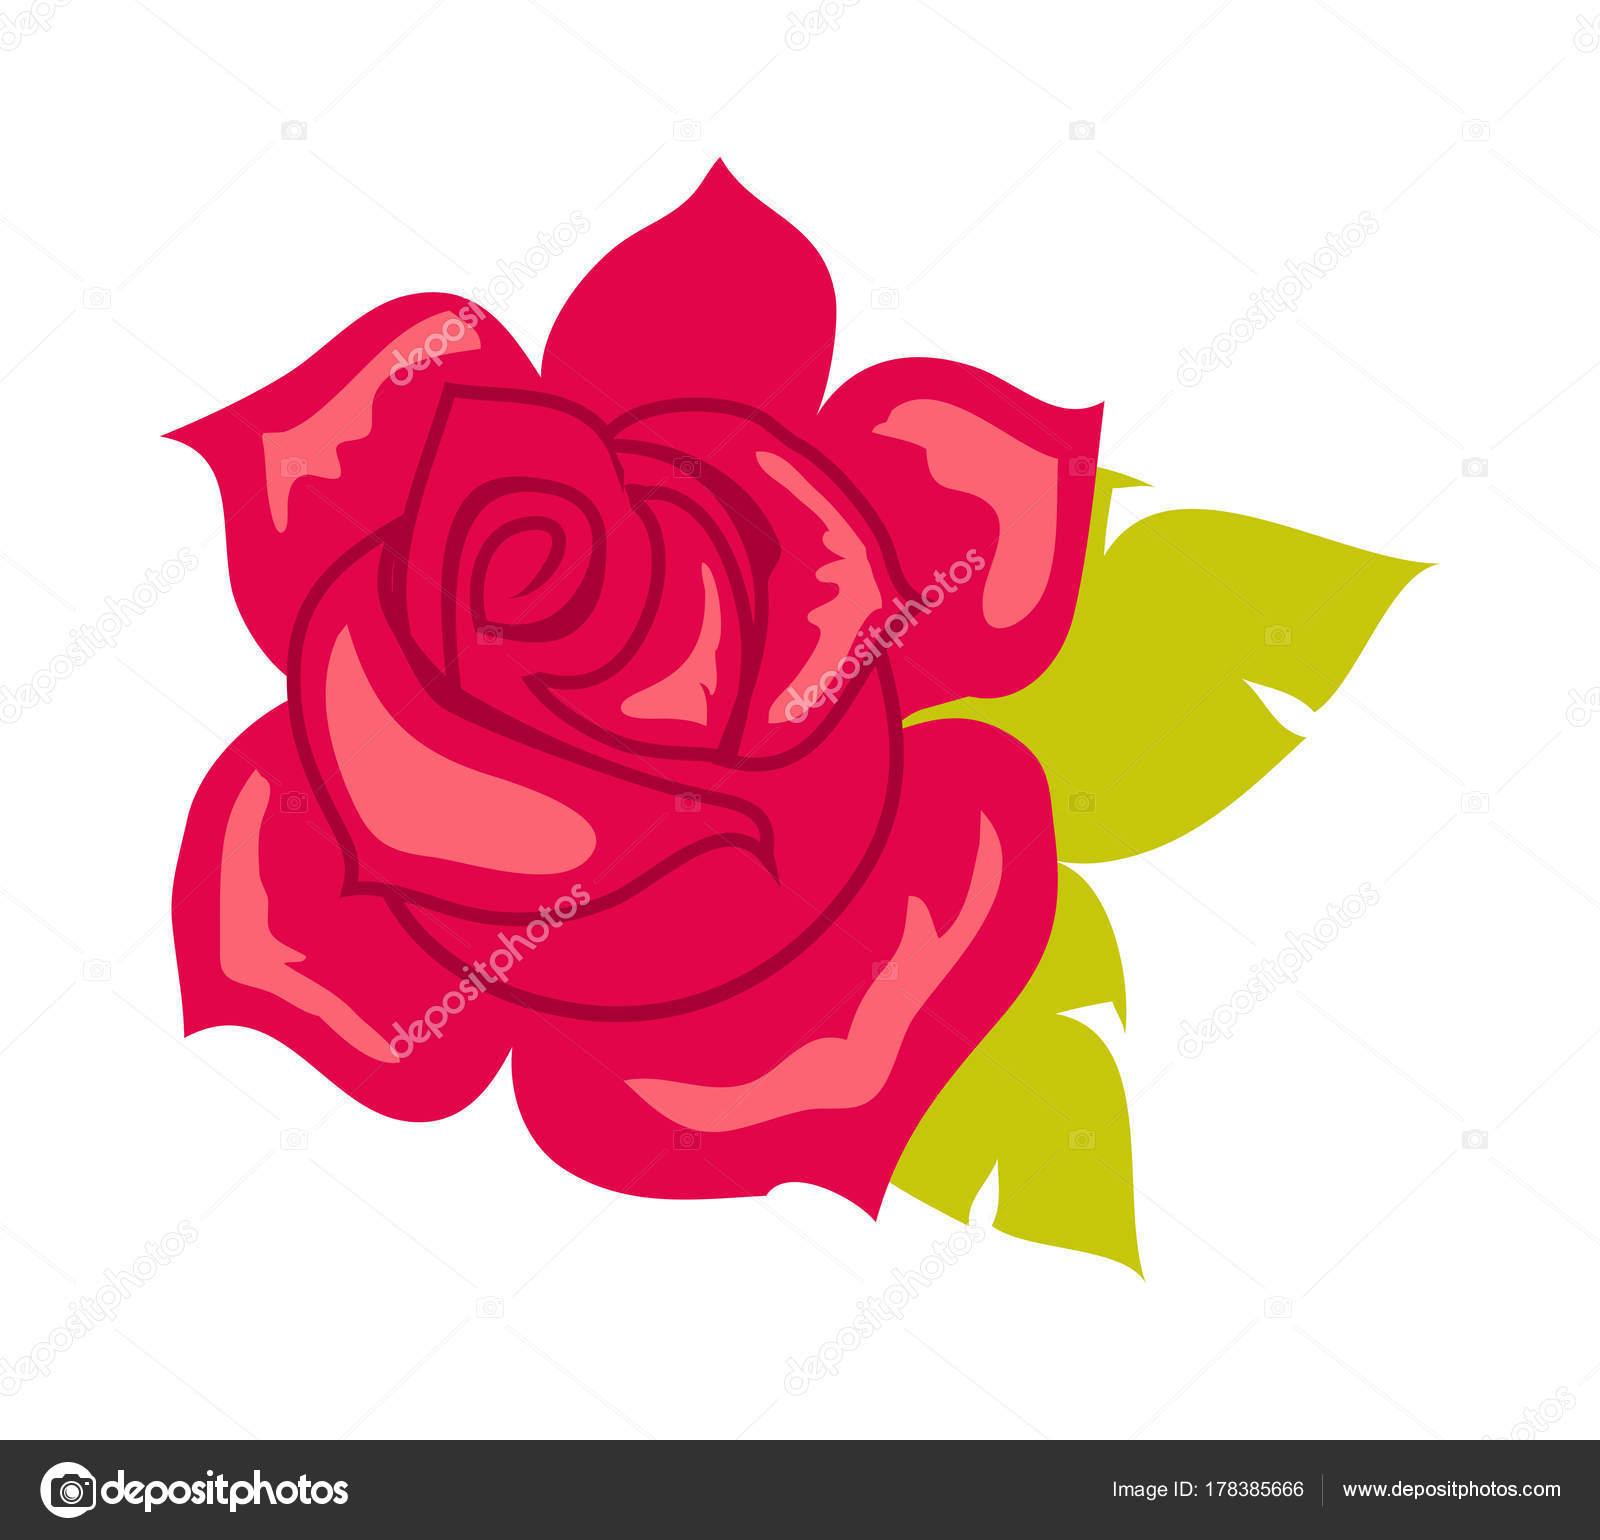 Rose Rouge Avec Feuille Verte Fleur En Style Cartoon Image